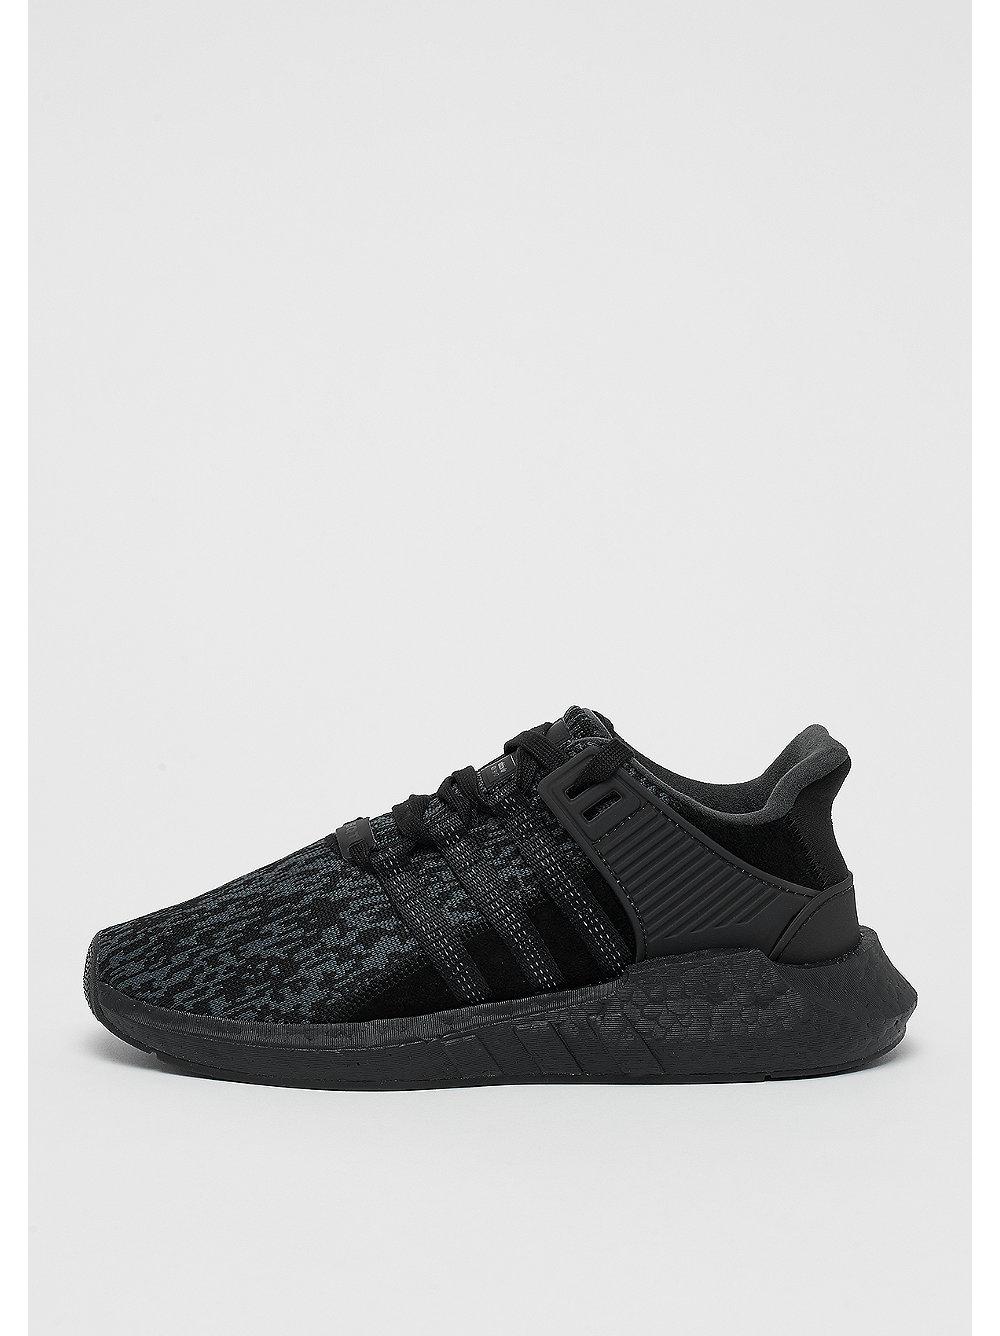 eqt support 93 17 sneaker black von adidas bei snipes. Black Bedroom Furniture Sets. Home Design Ideas